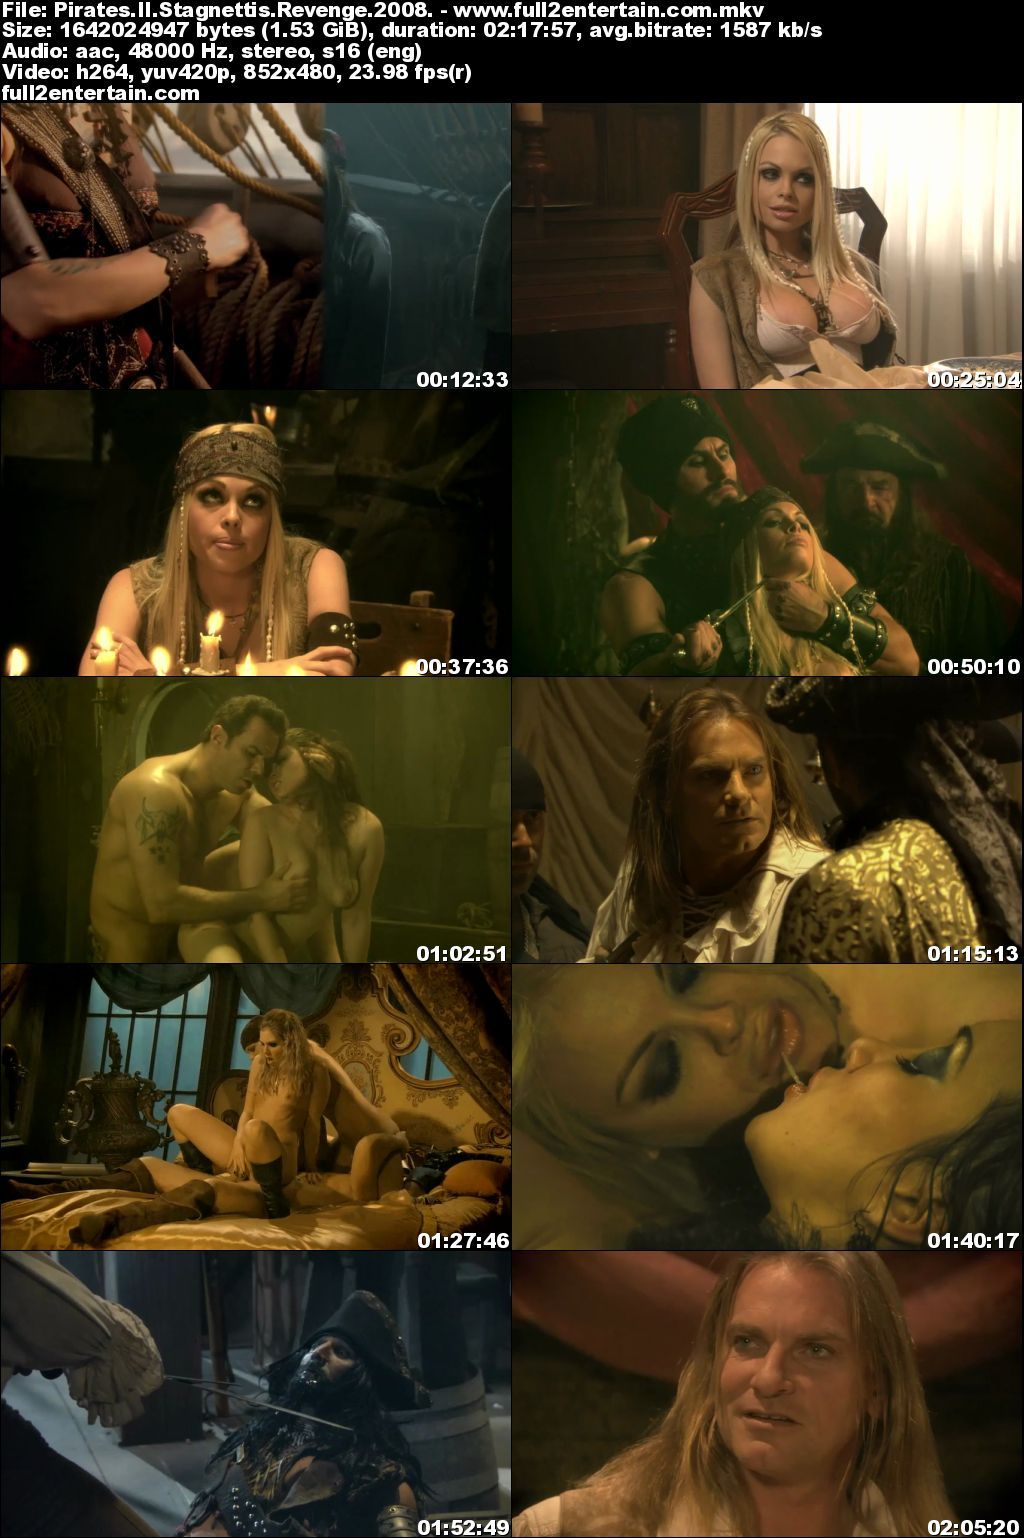 Pirates II: Stagnetti's Revenge Full Movie Free Download Hd - 2008 (1080p)